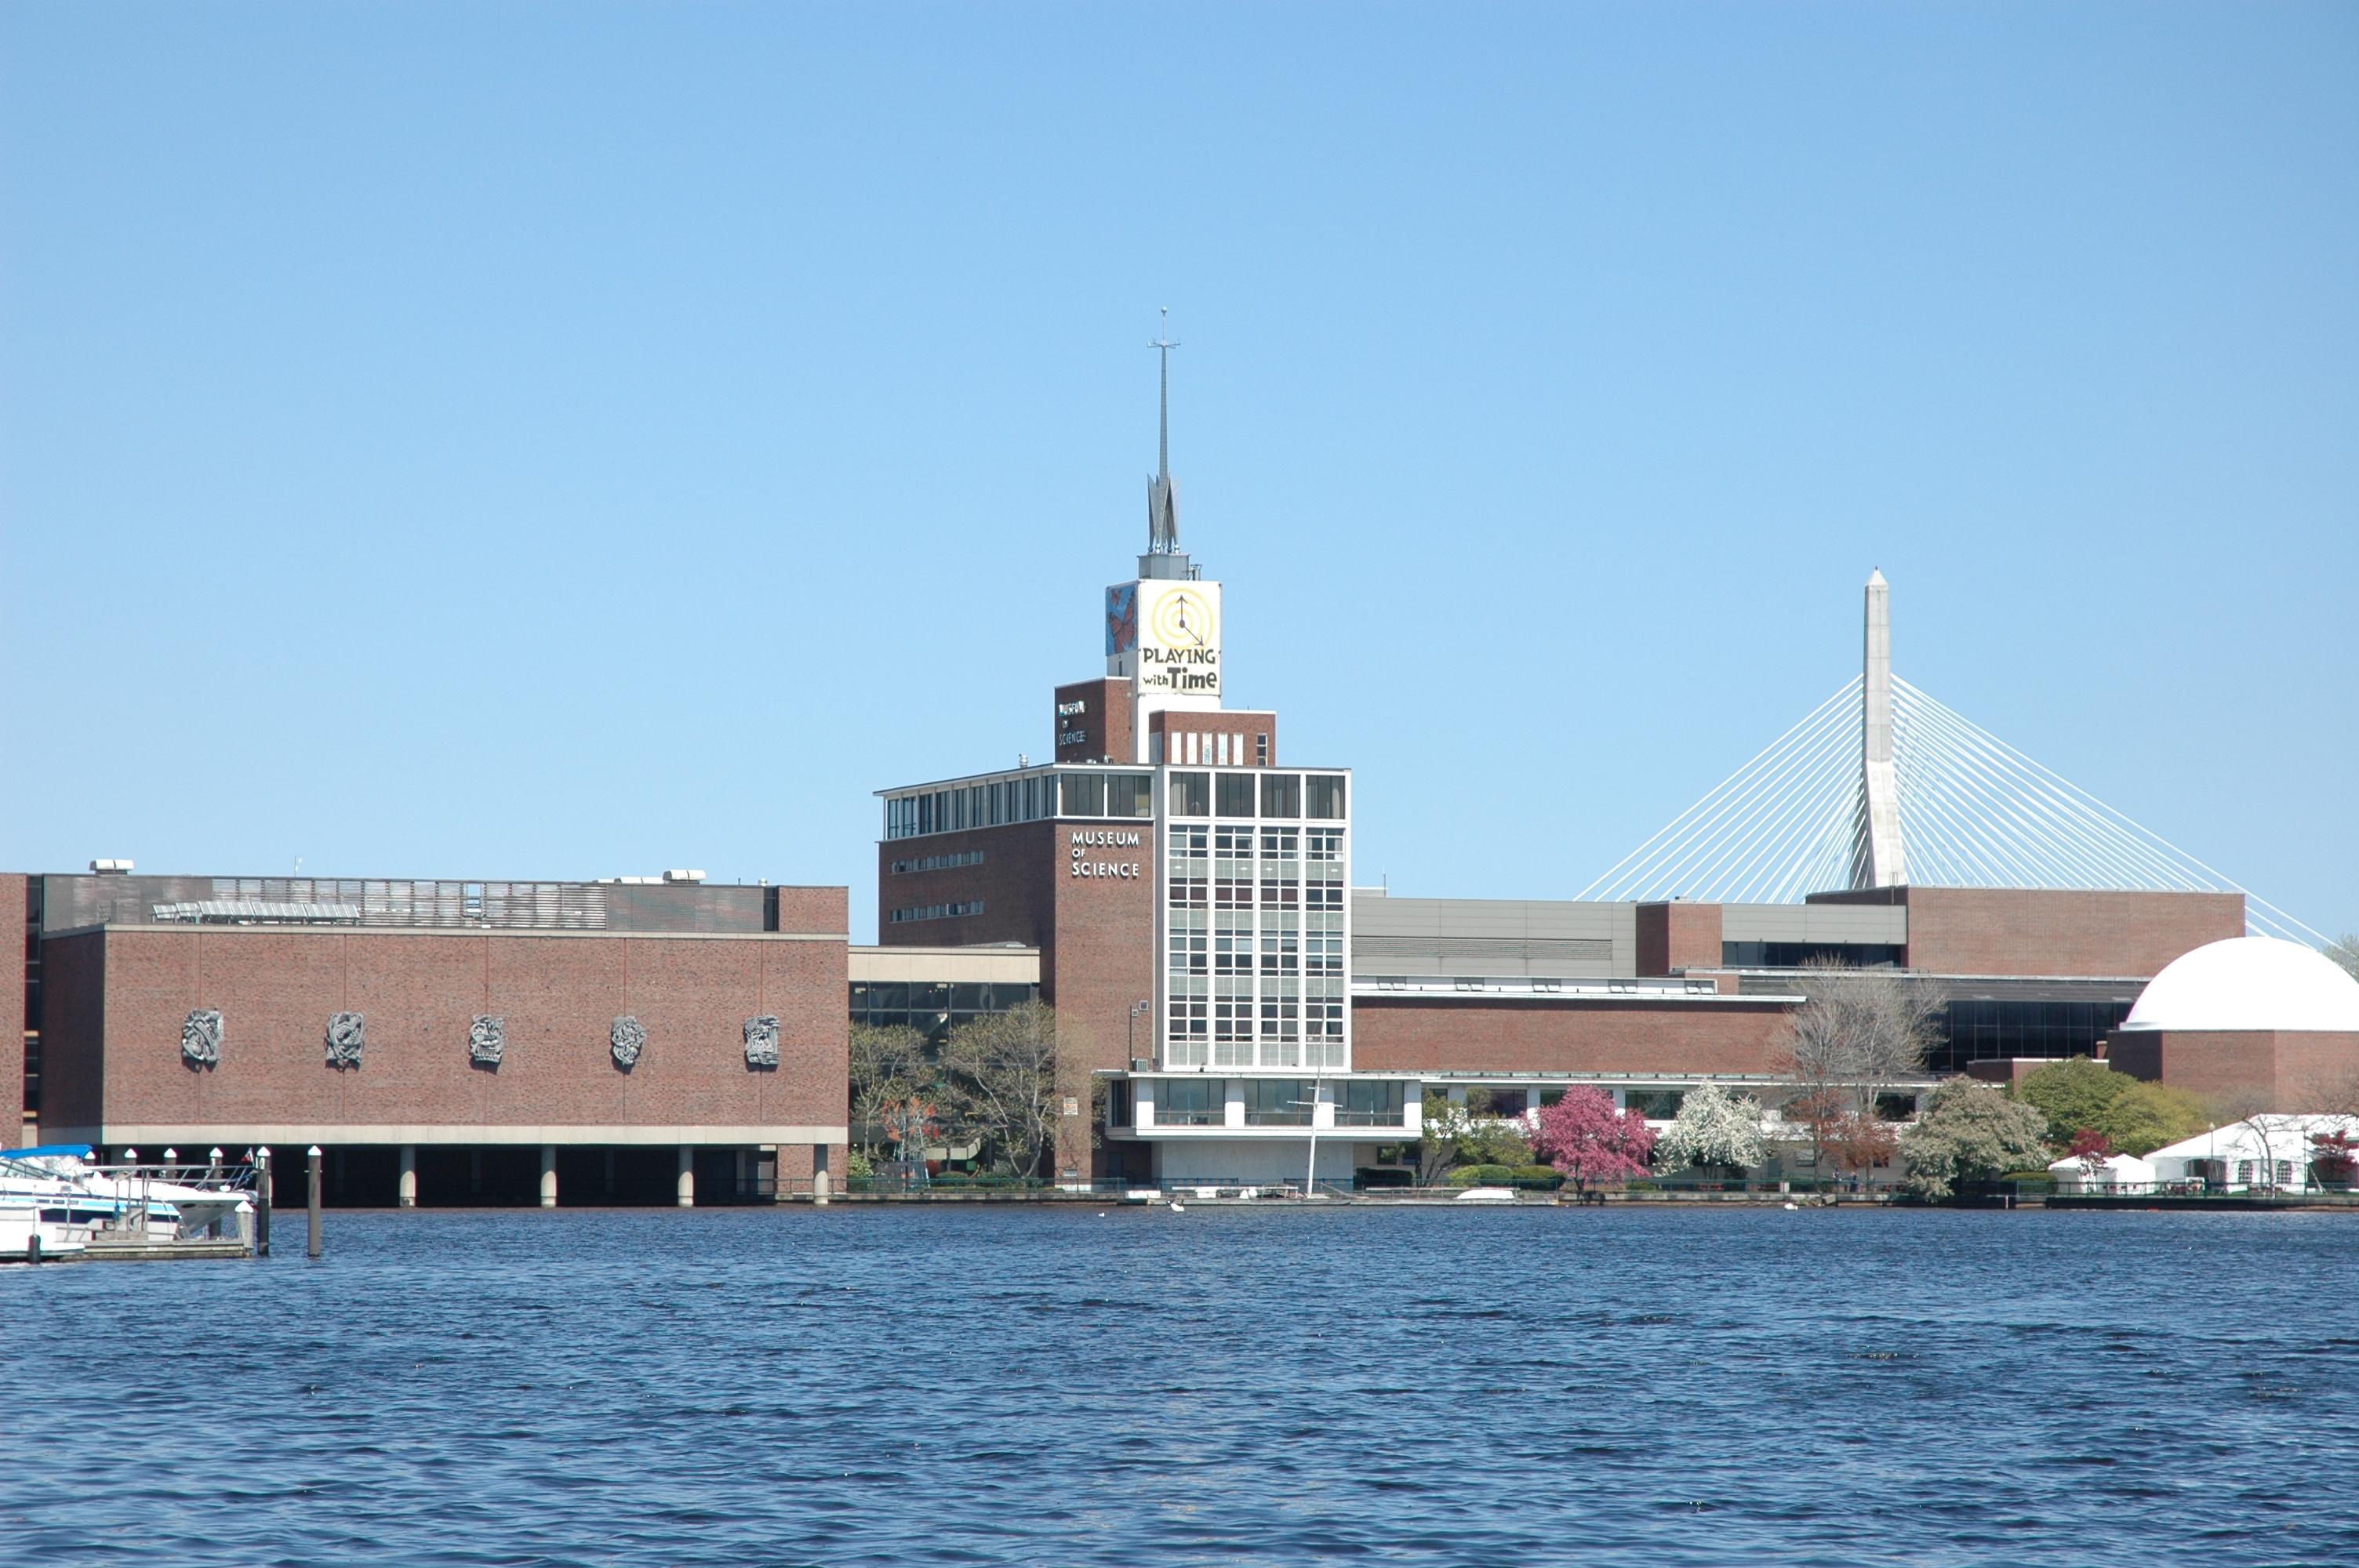 Boston Wedding Venues: #1 Museum of Science!